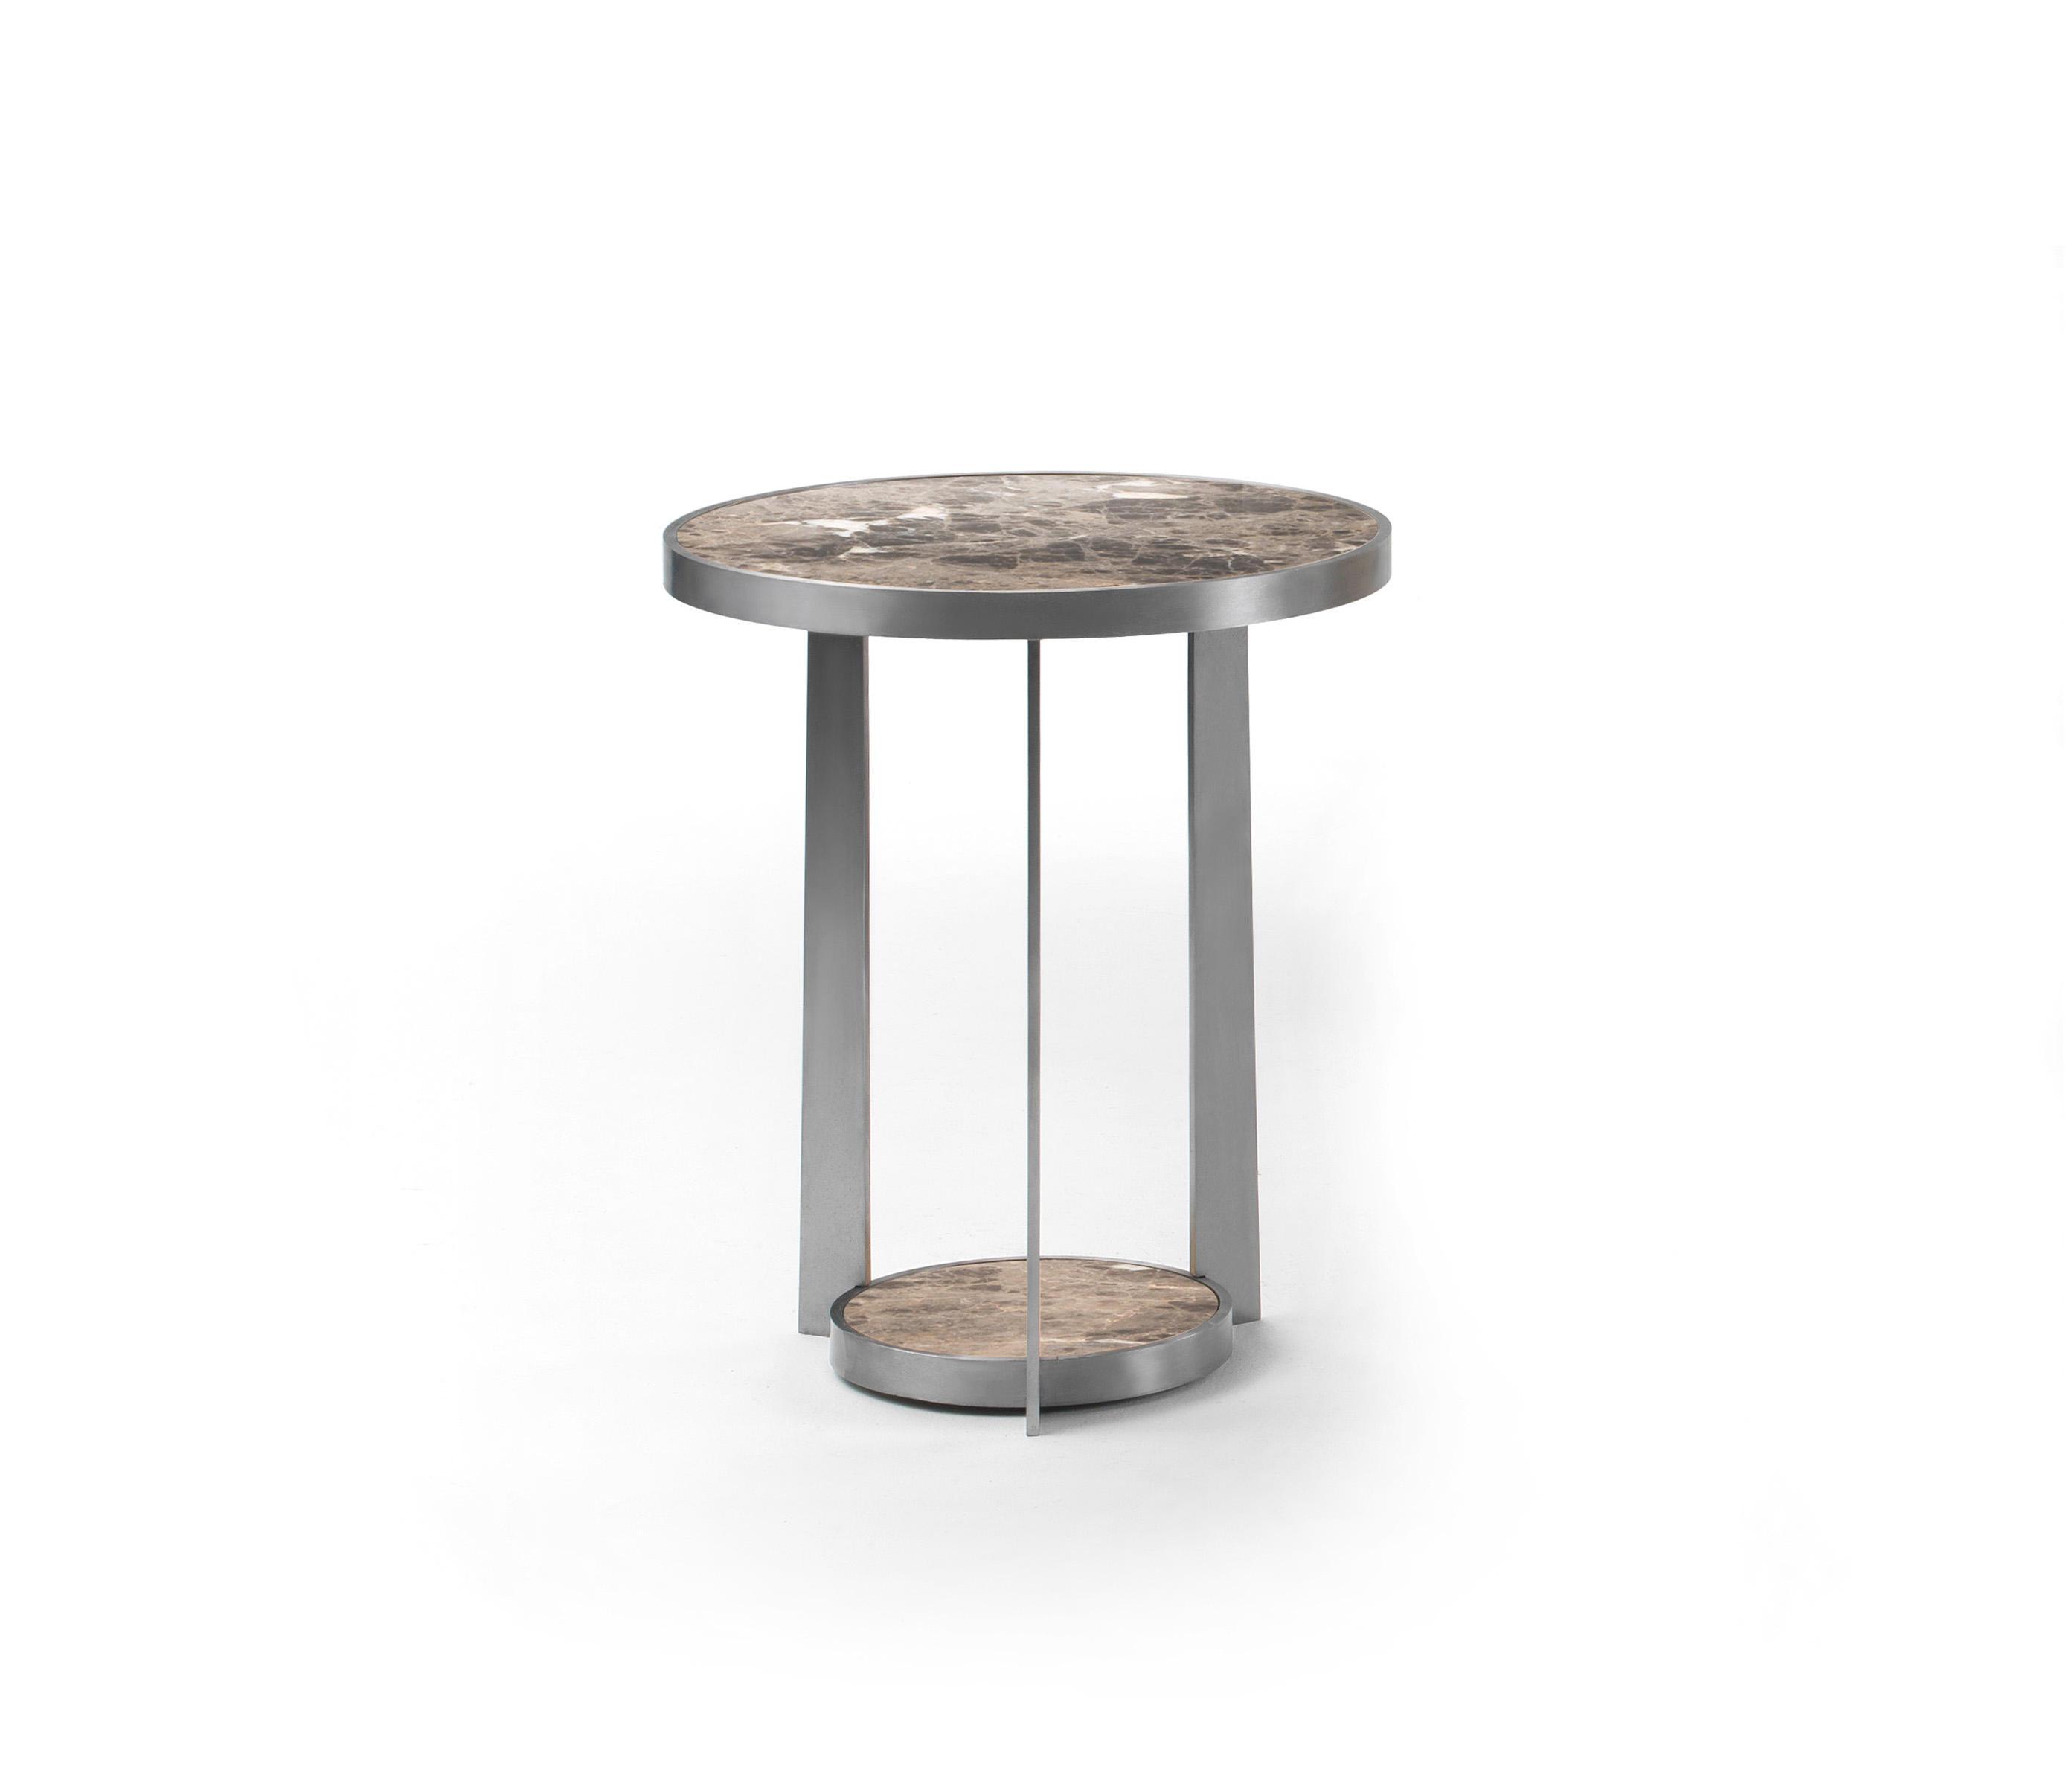 Fauno By Flexform Mood Side Tables